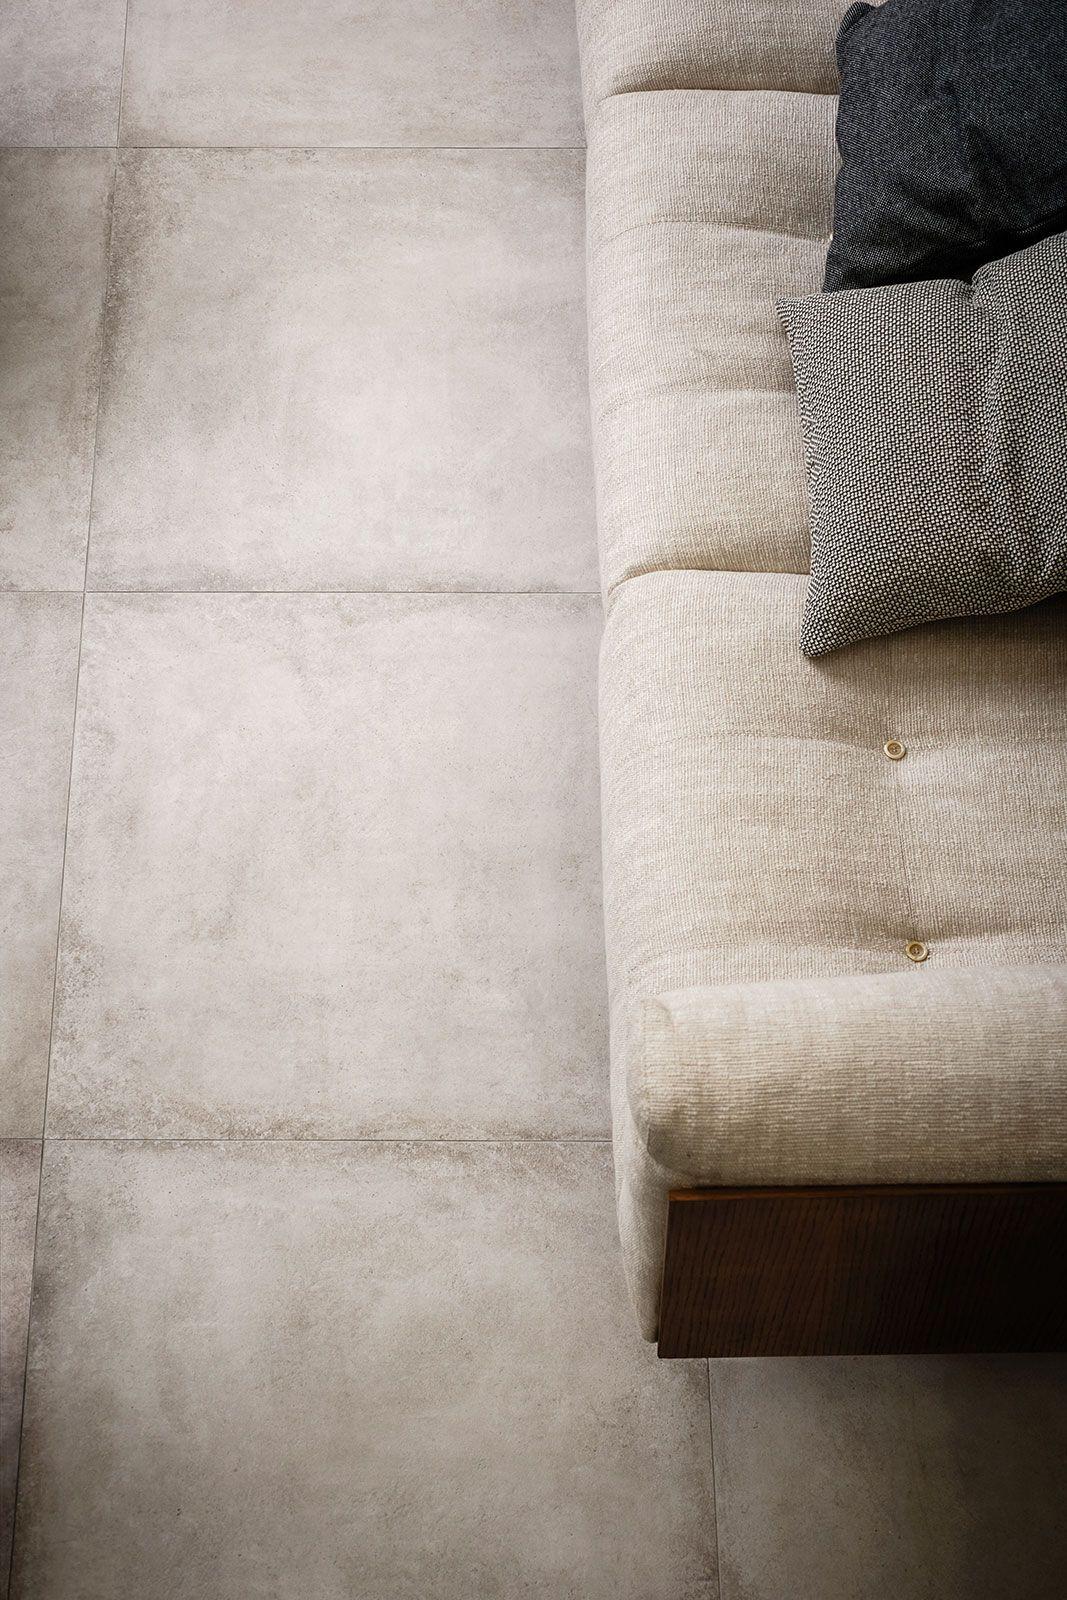 Clays ceramic tiles Marazzi_6607   interieur   Pinterest ...